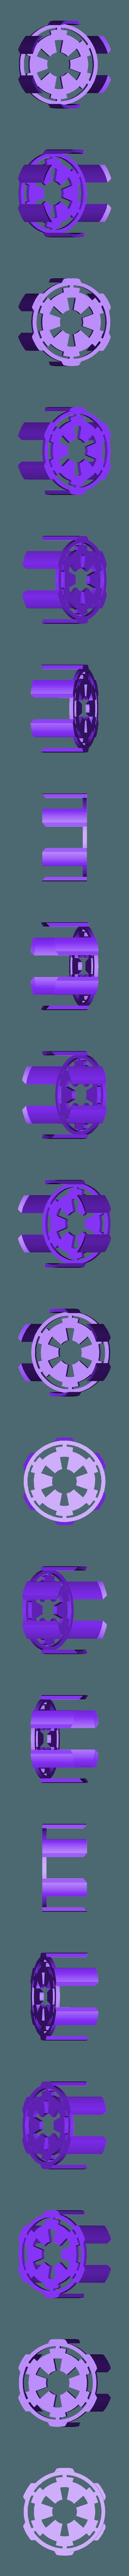 Coaster_Holder.stl Download free STL file Galactic Empire coaster holder • Design to 3D print, fezz